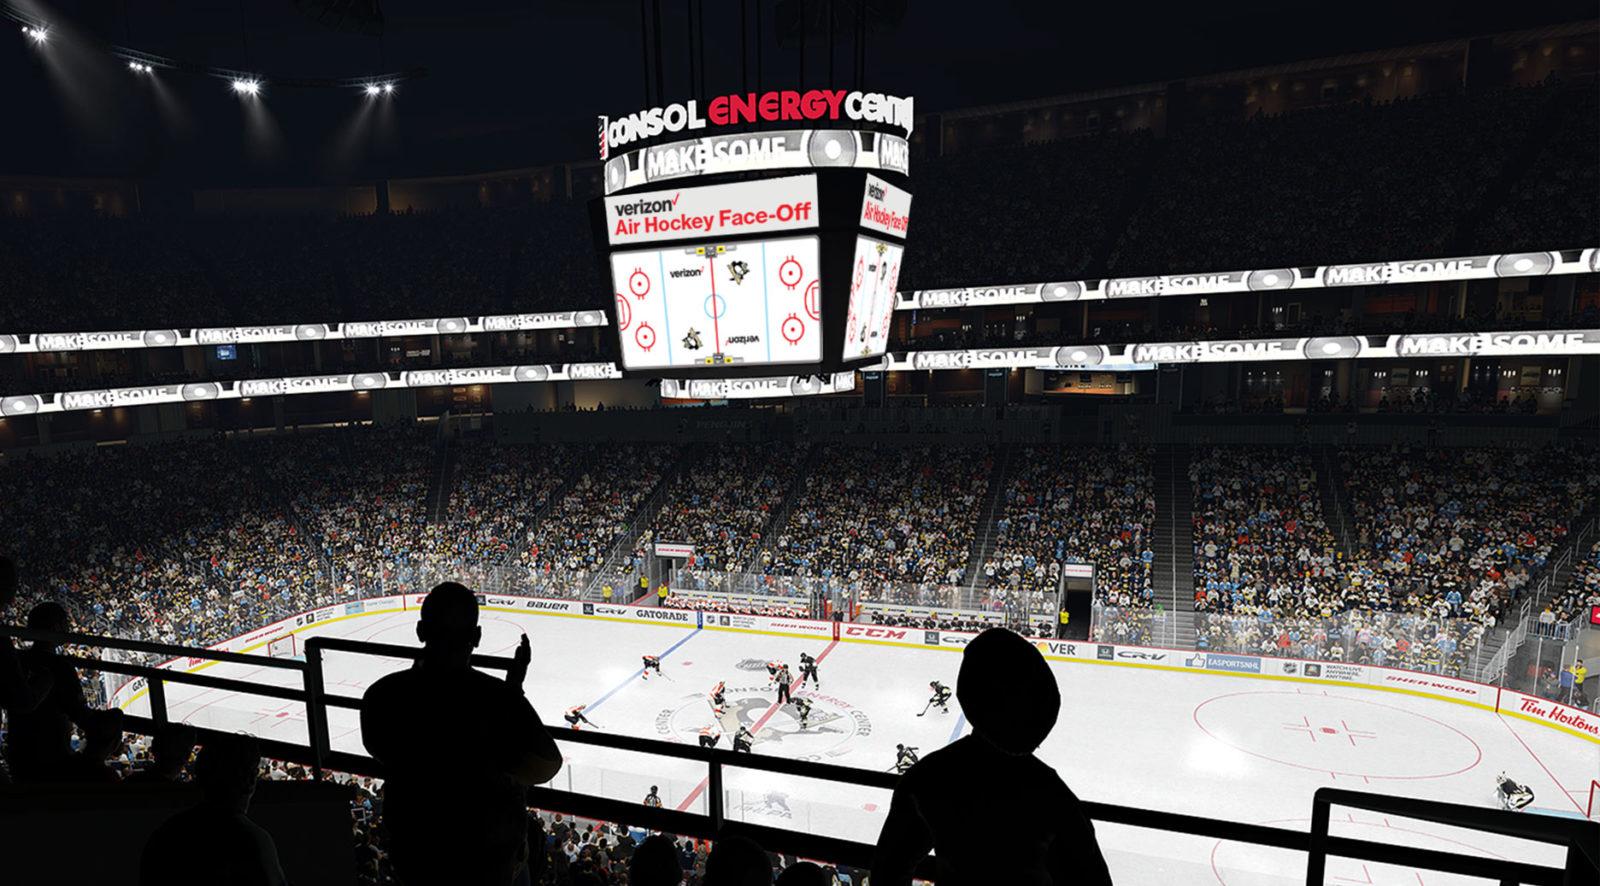 consol-enengy-air-hockey-jumbotron